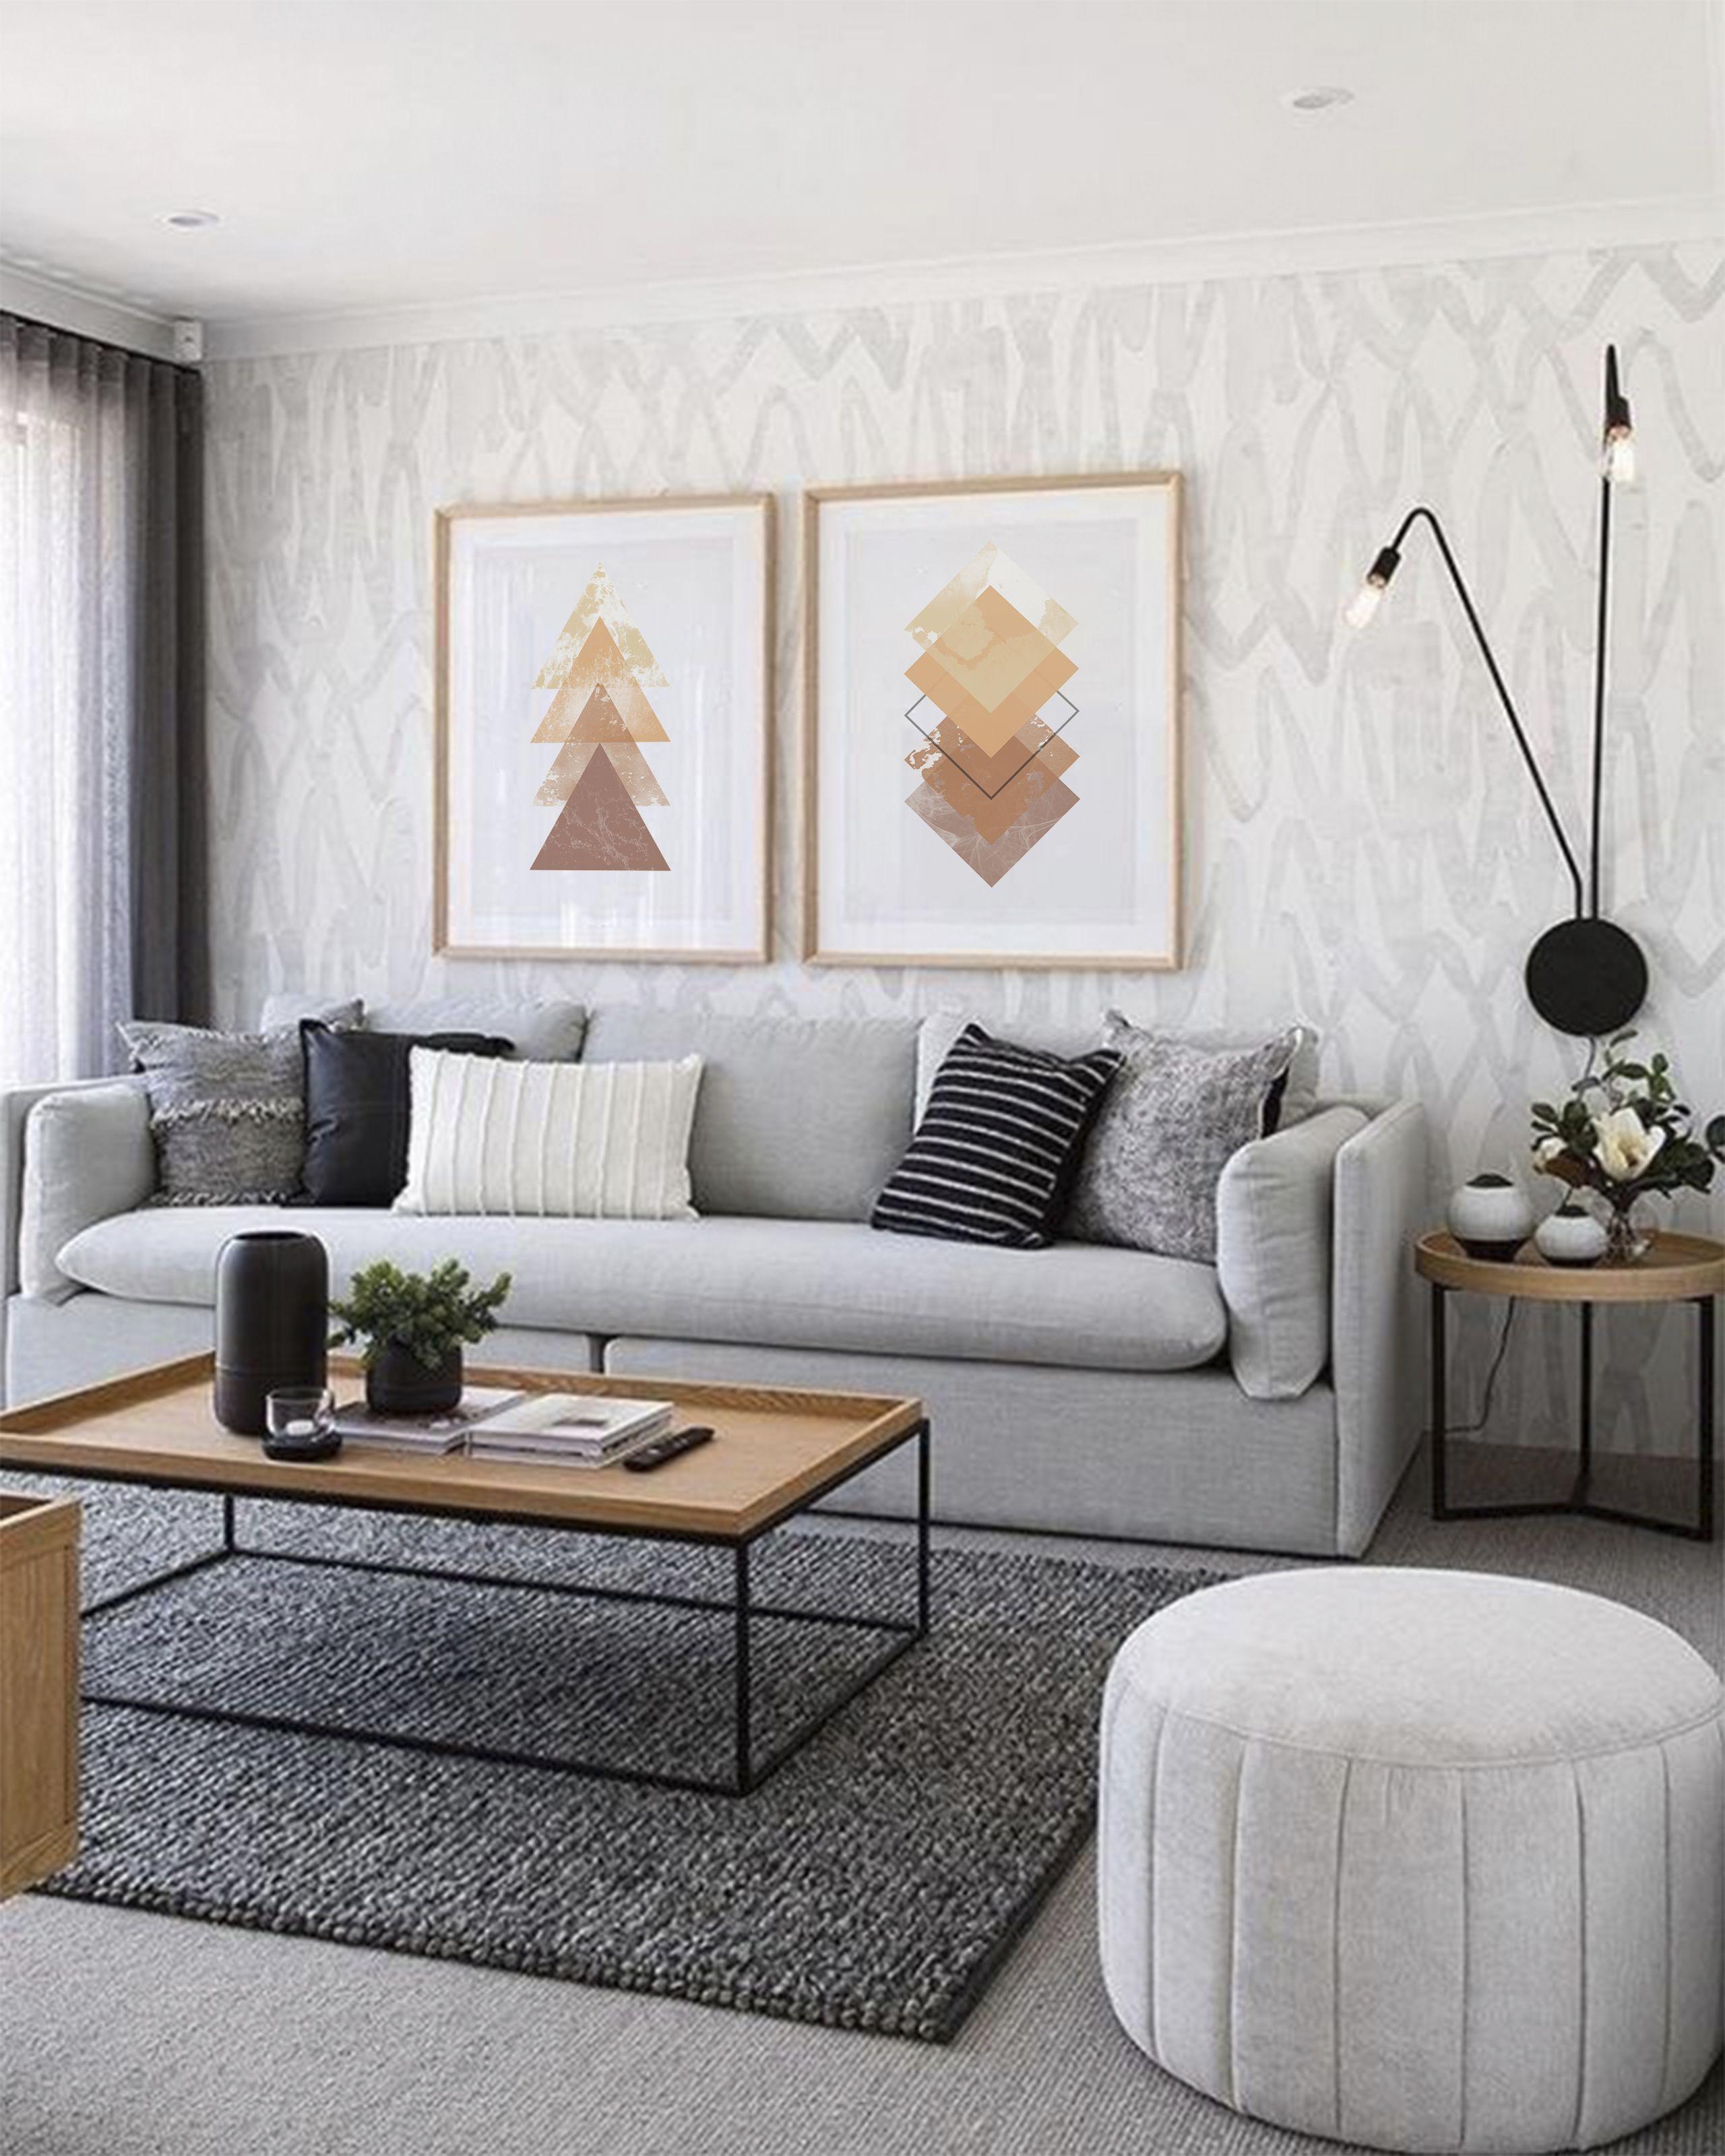 Geometric Printable Wall Art Digital Print Gold And Brown Triangles Bedroom Poster Set Of 2 Prints Living Room Decor Apartment Living Room Decor Modern Living Room Color